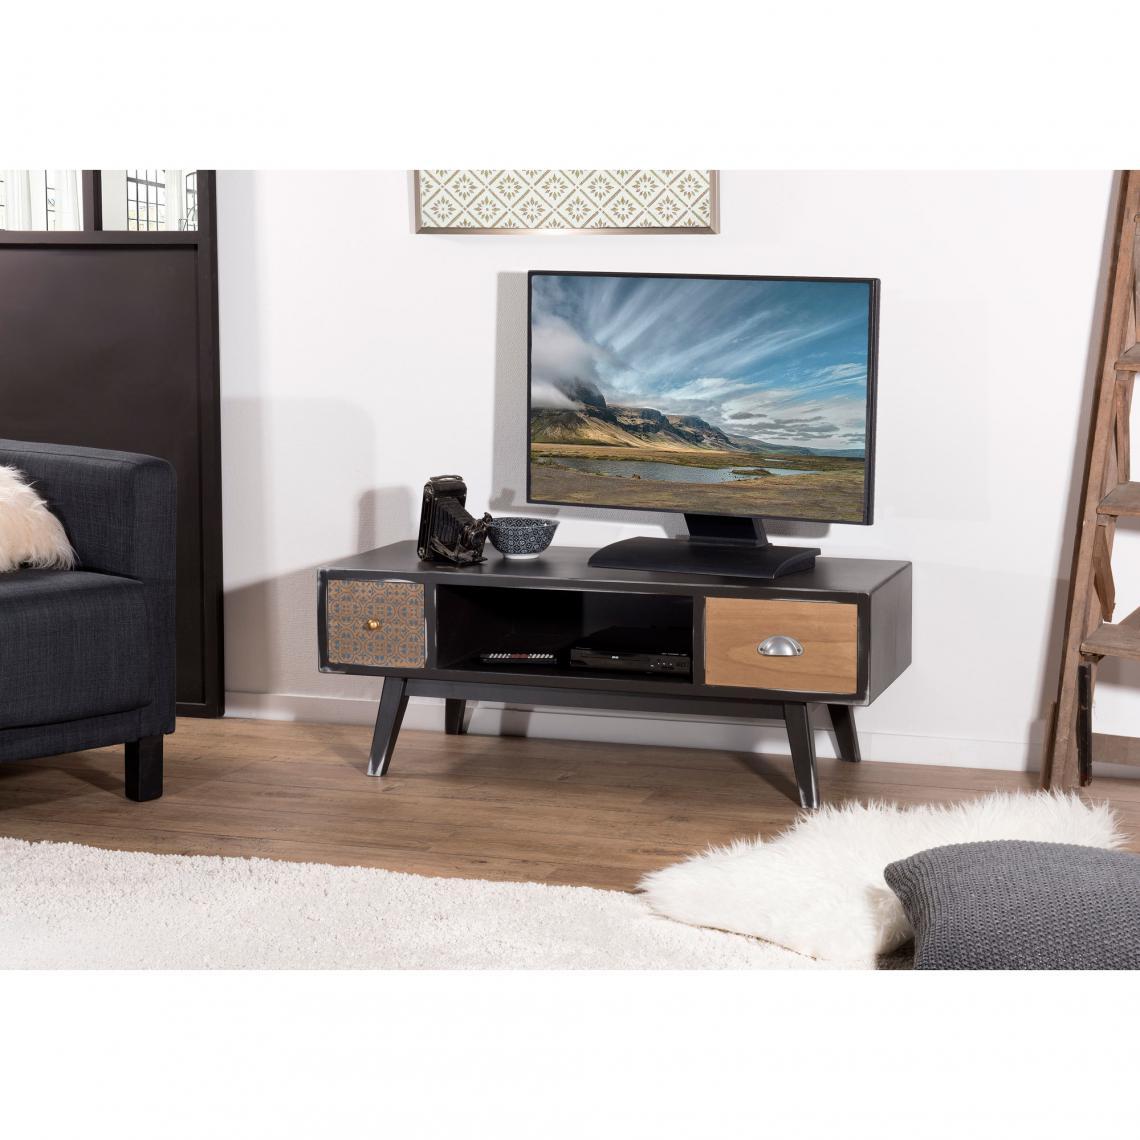 Meuble Tv 1 Niche 2 Tiroirs Style Scandinave Et Industriel Noir